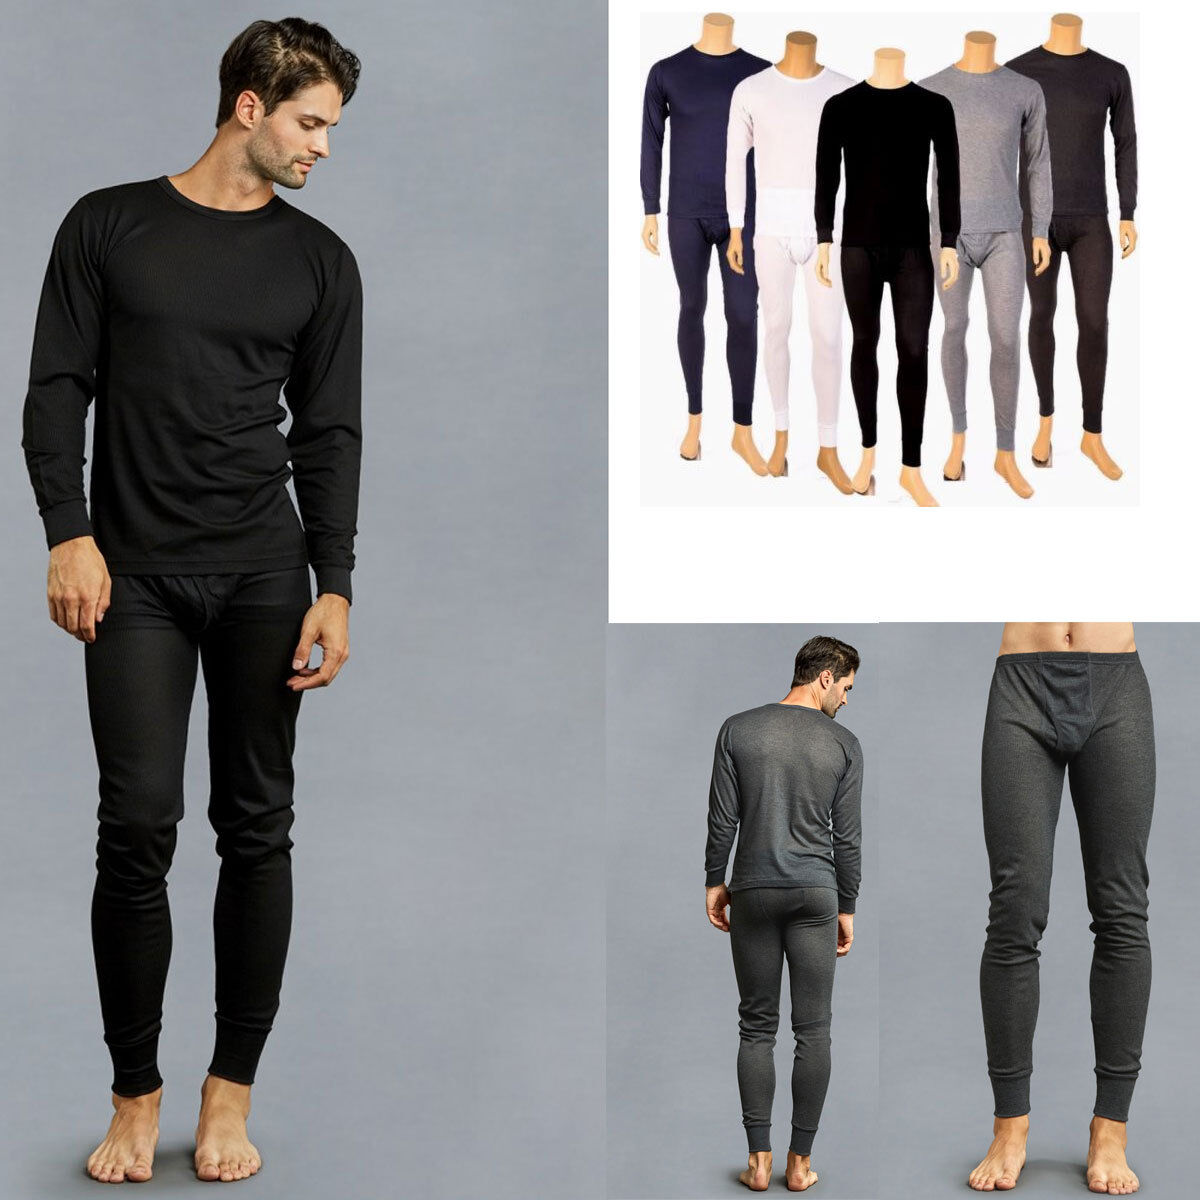 Купить Knocker - Knocker Mens Lot 2PC Thermal Underwear Set Top Bottom Long John Waffle New Pants